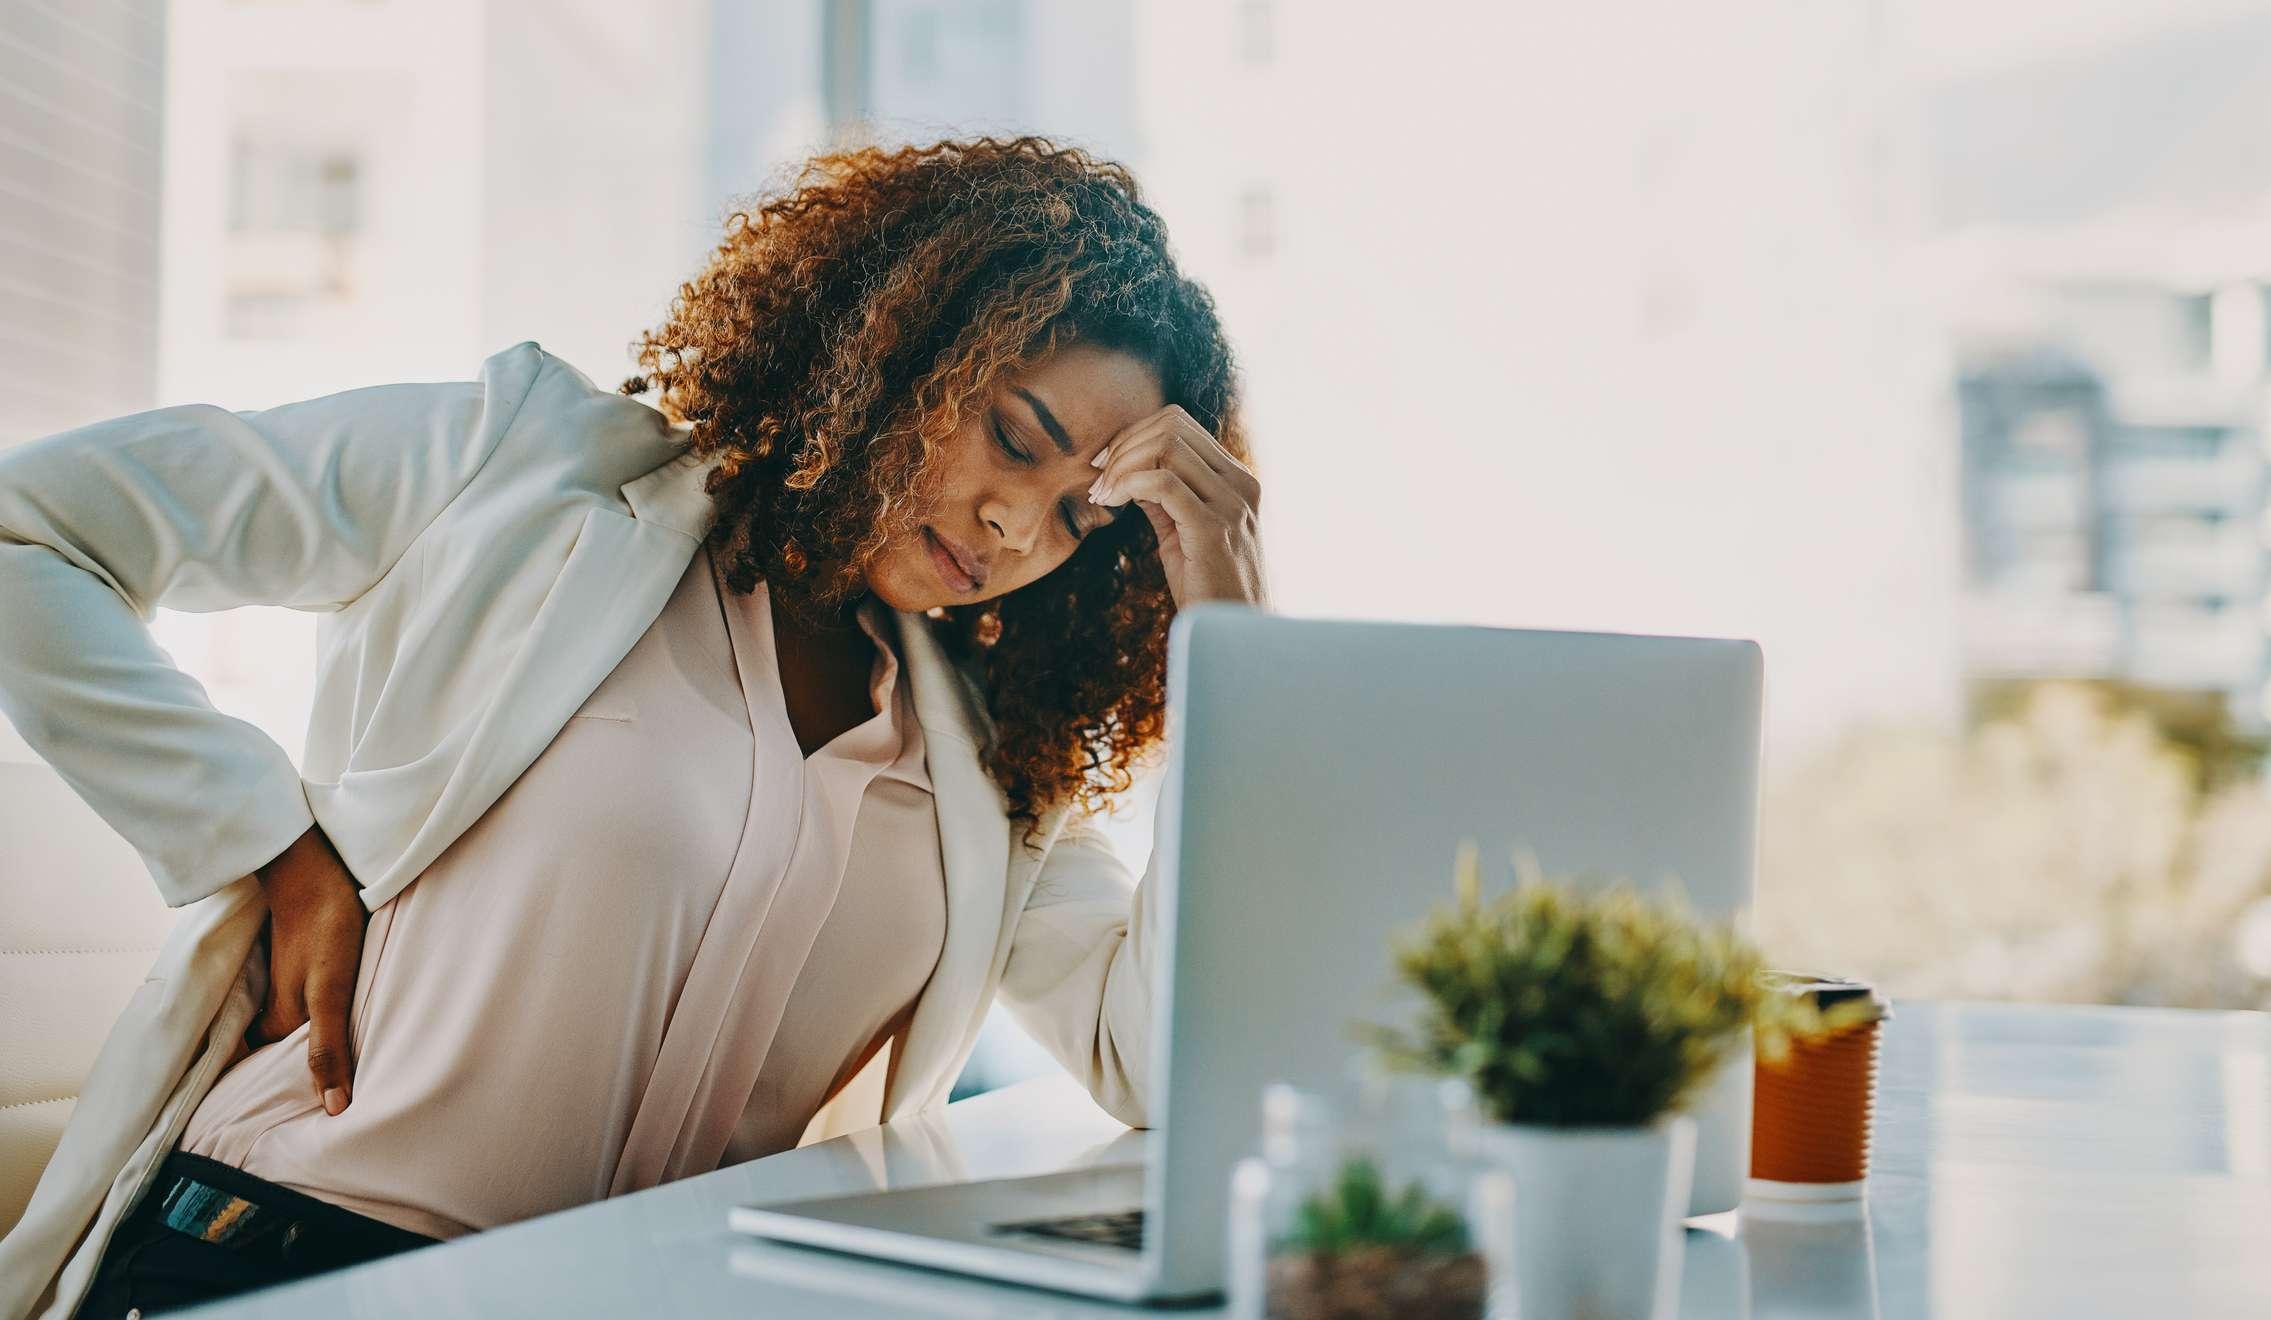 women holding lower back in pain